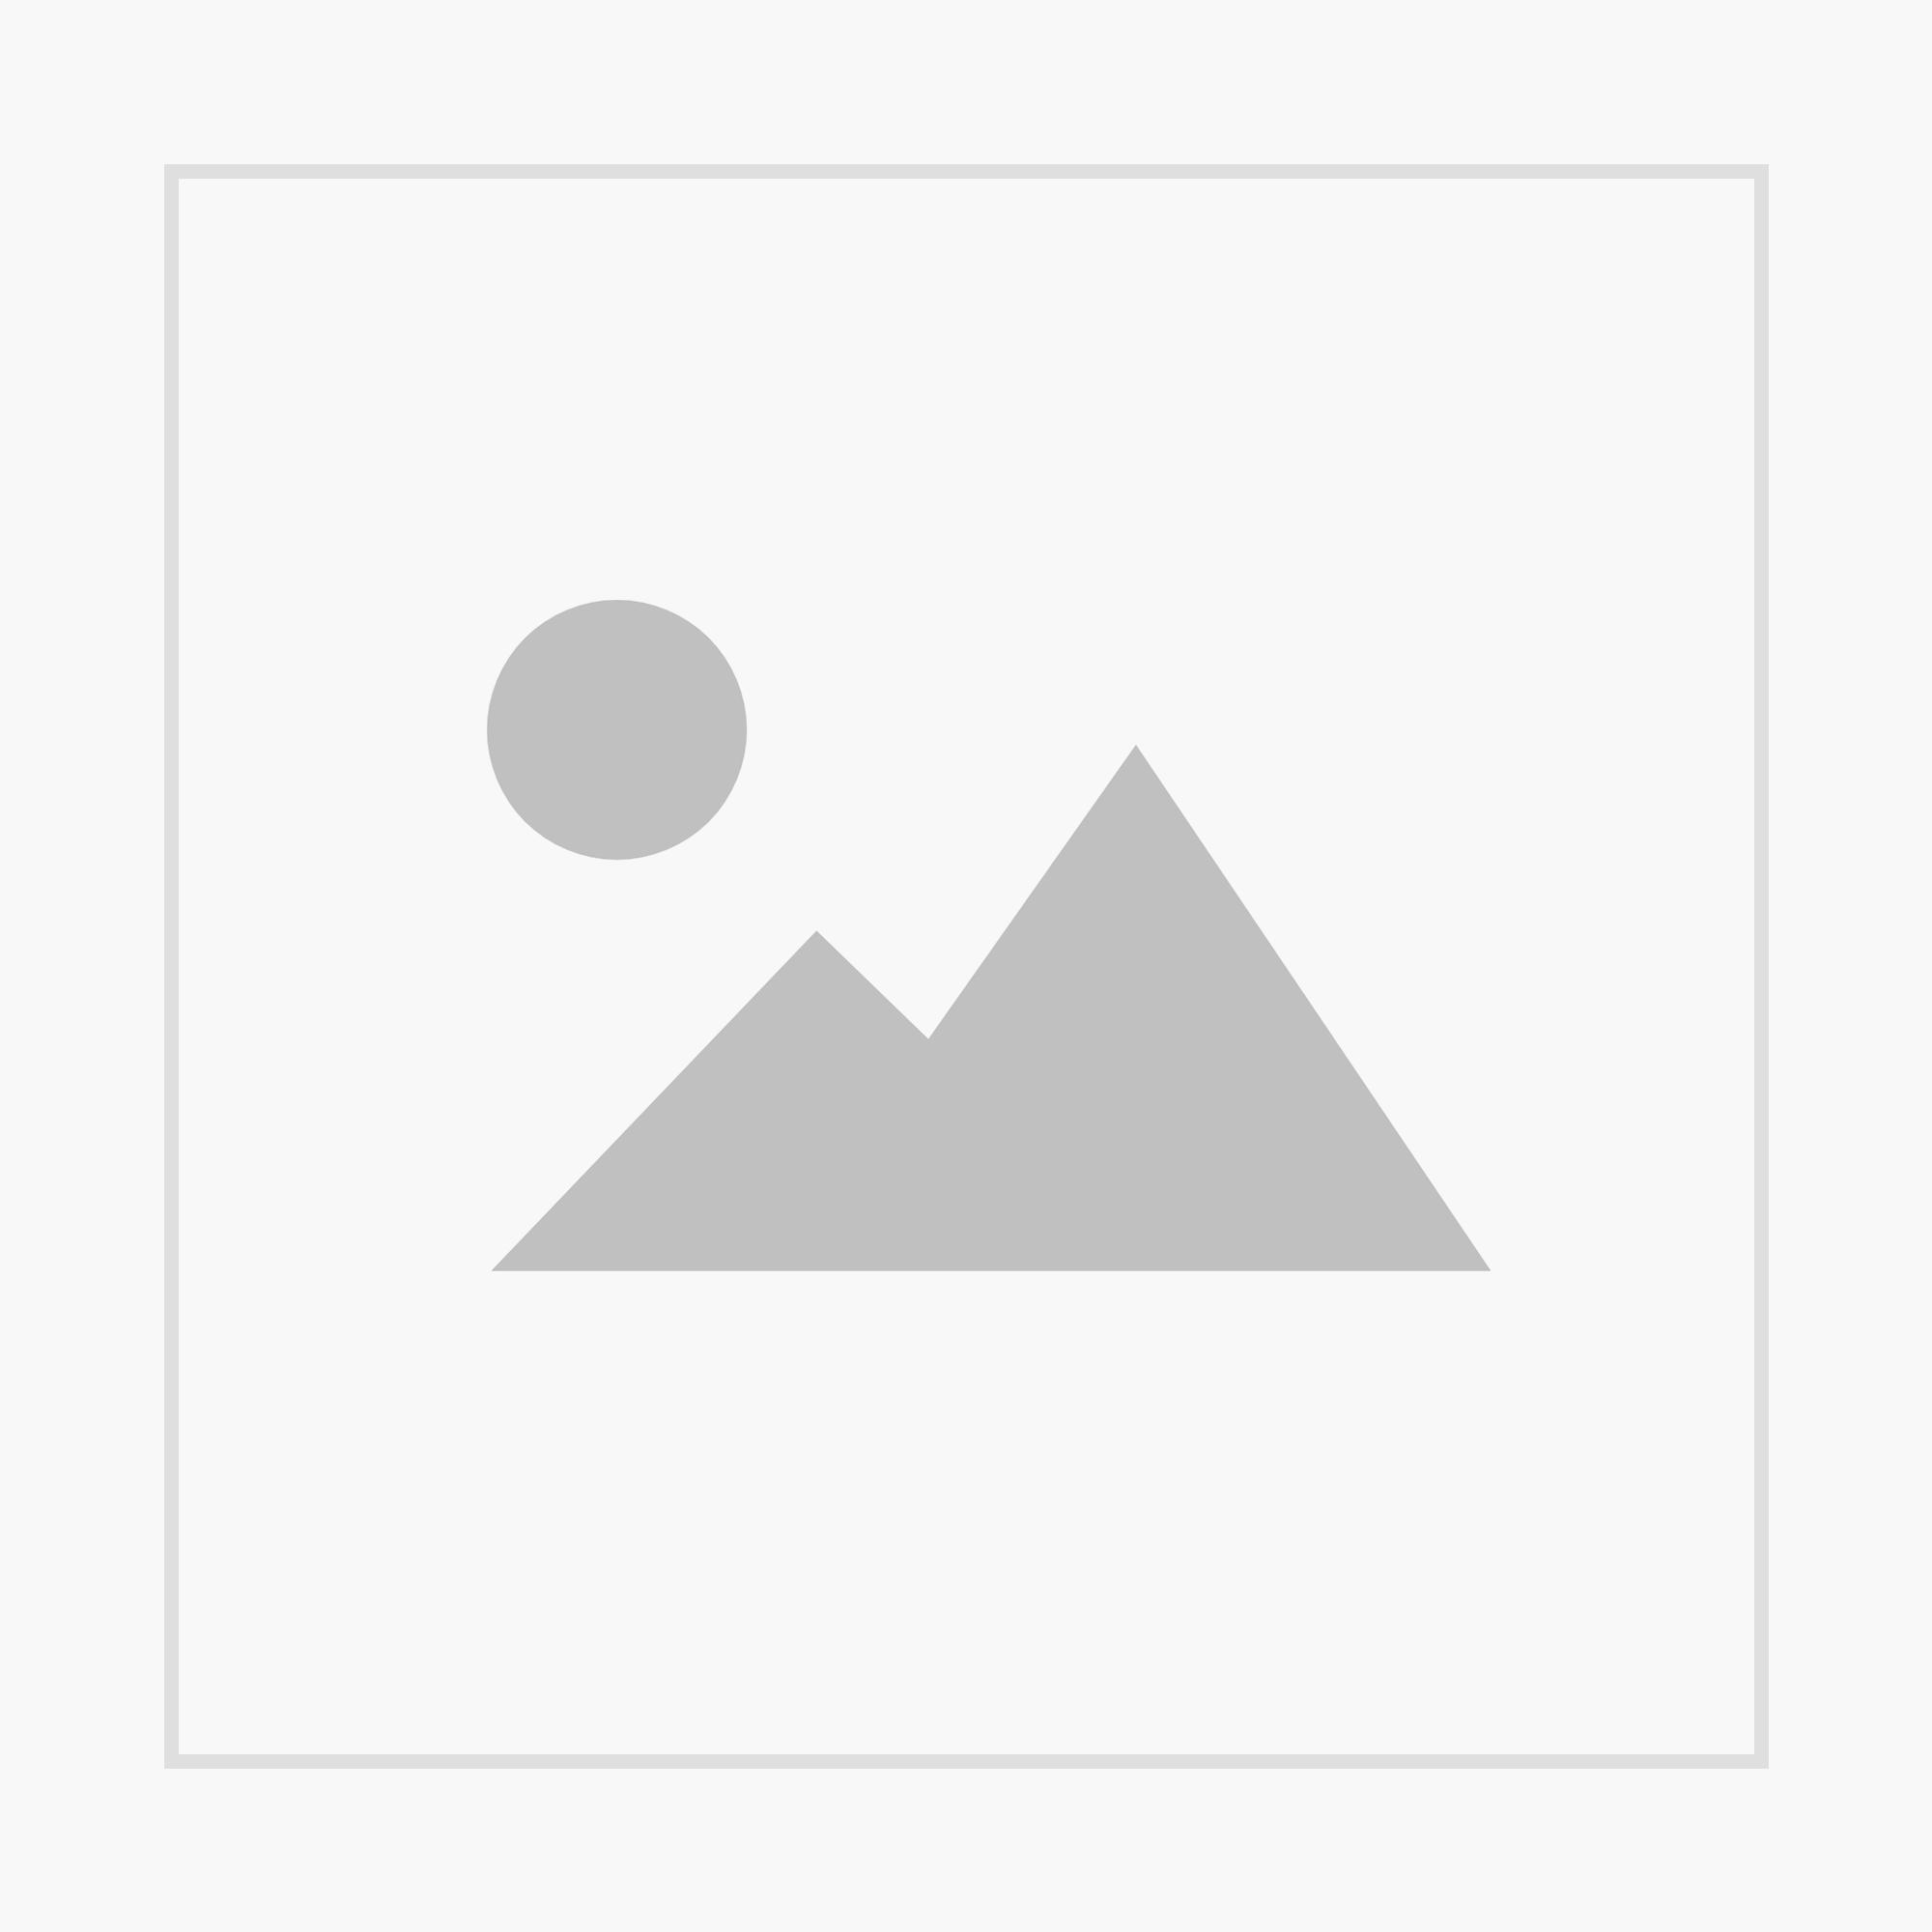 profi Landtechnik Kalender 2021